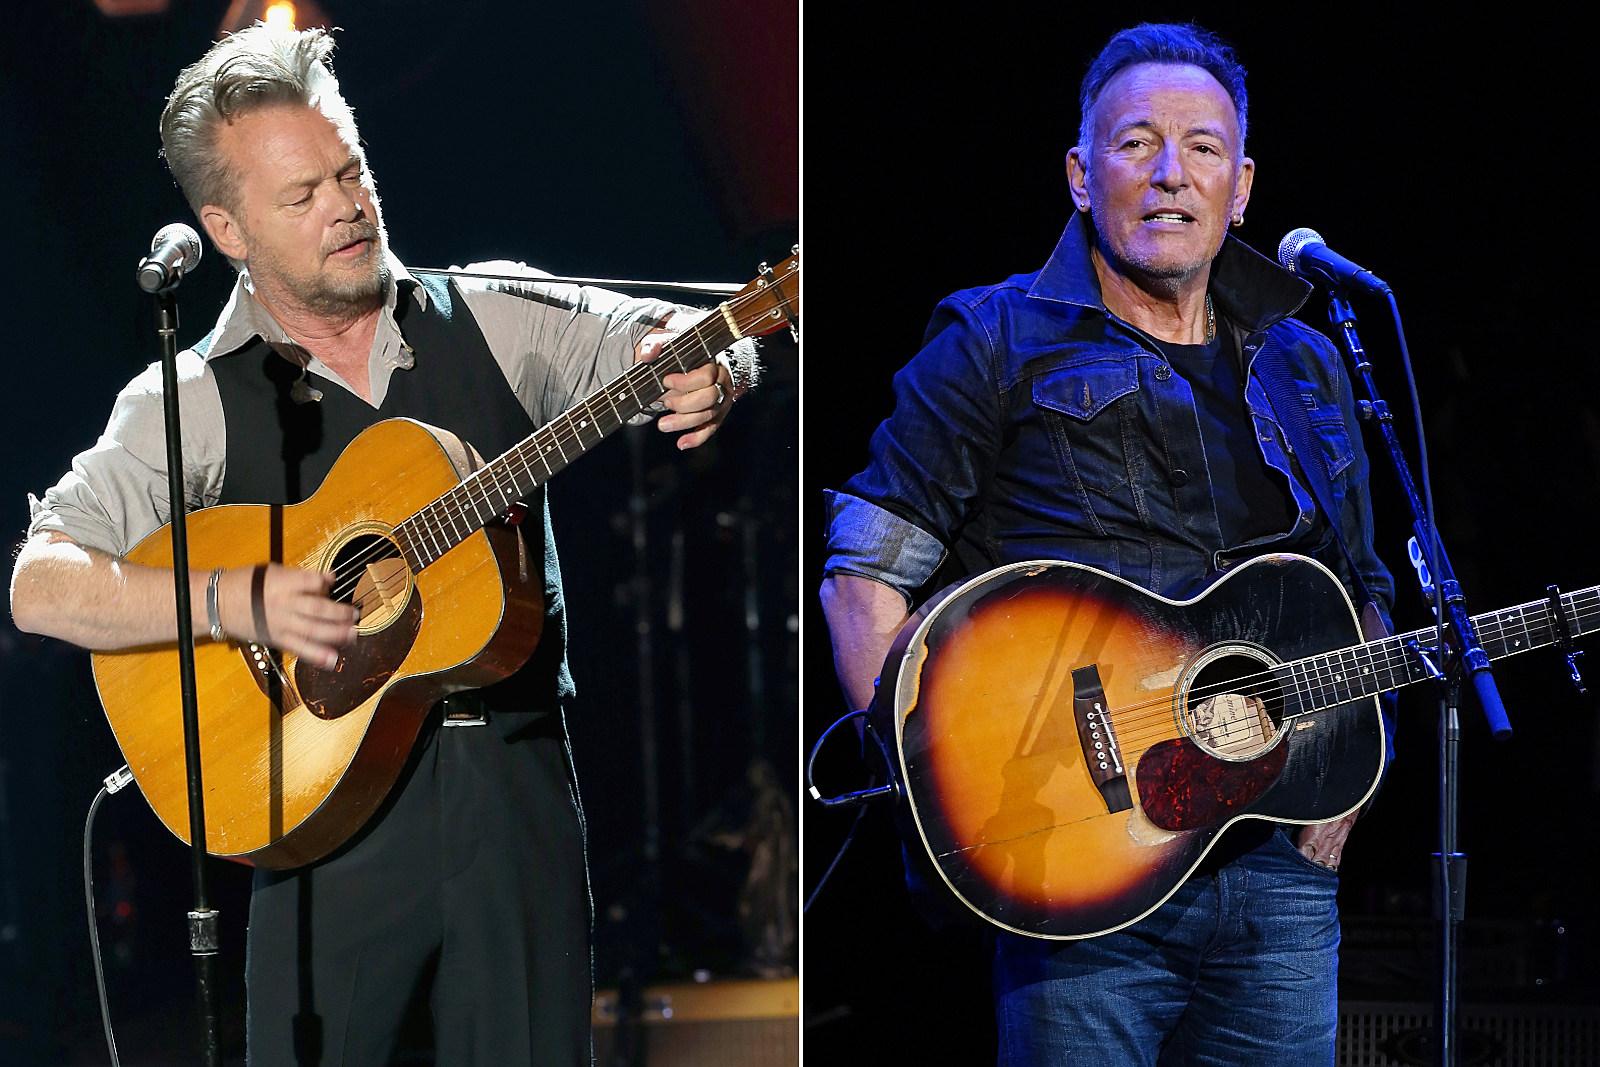 John Mellencamp Says Bruce Springsteen is Like a 'Big Brother'